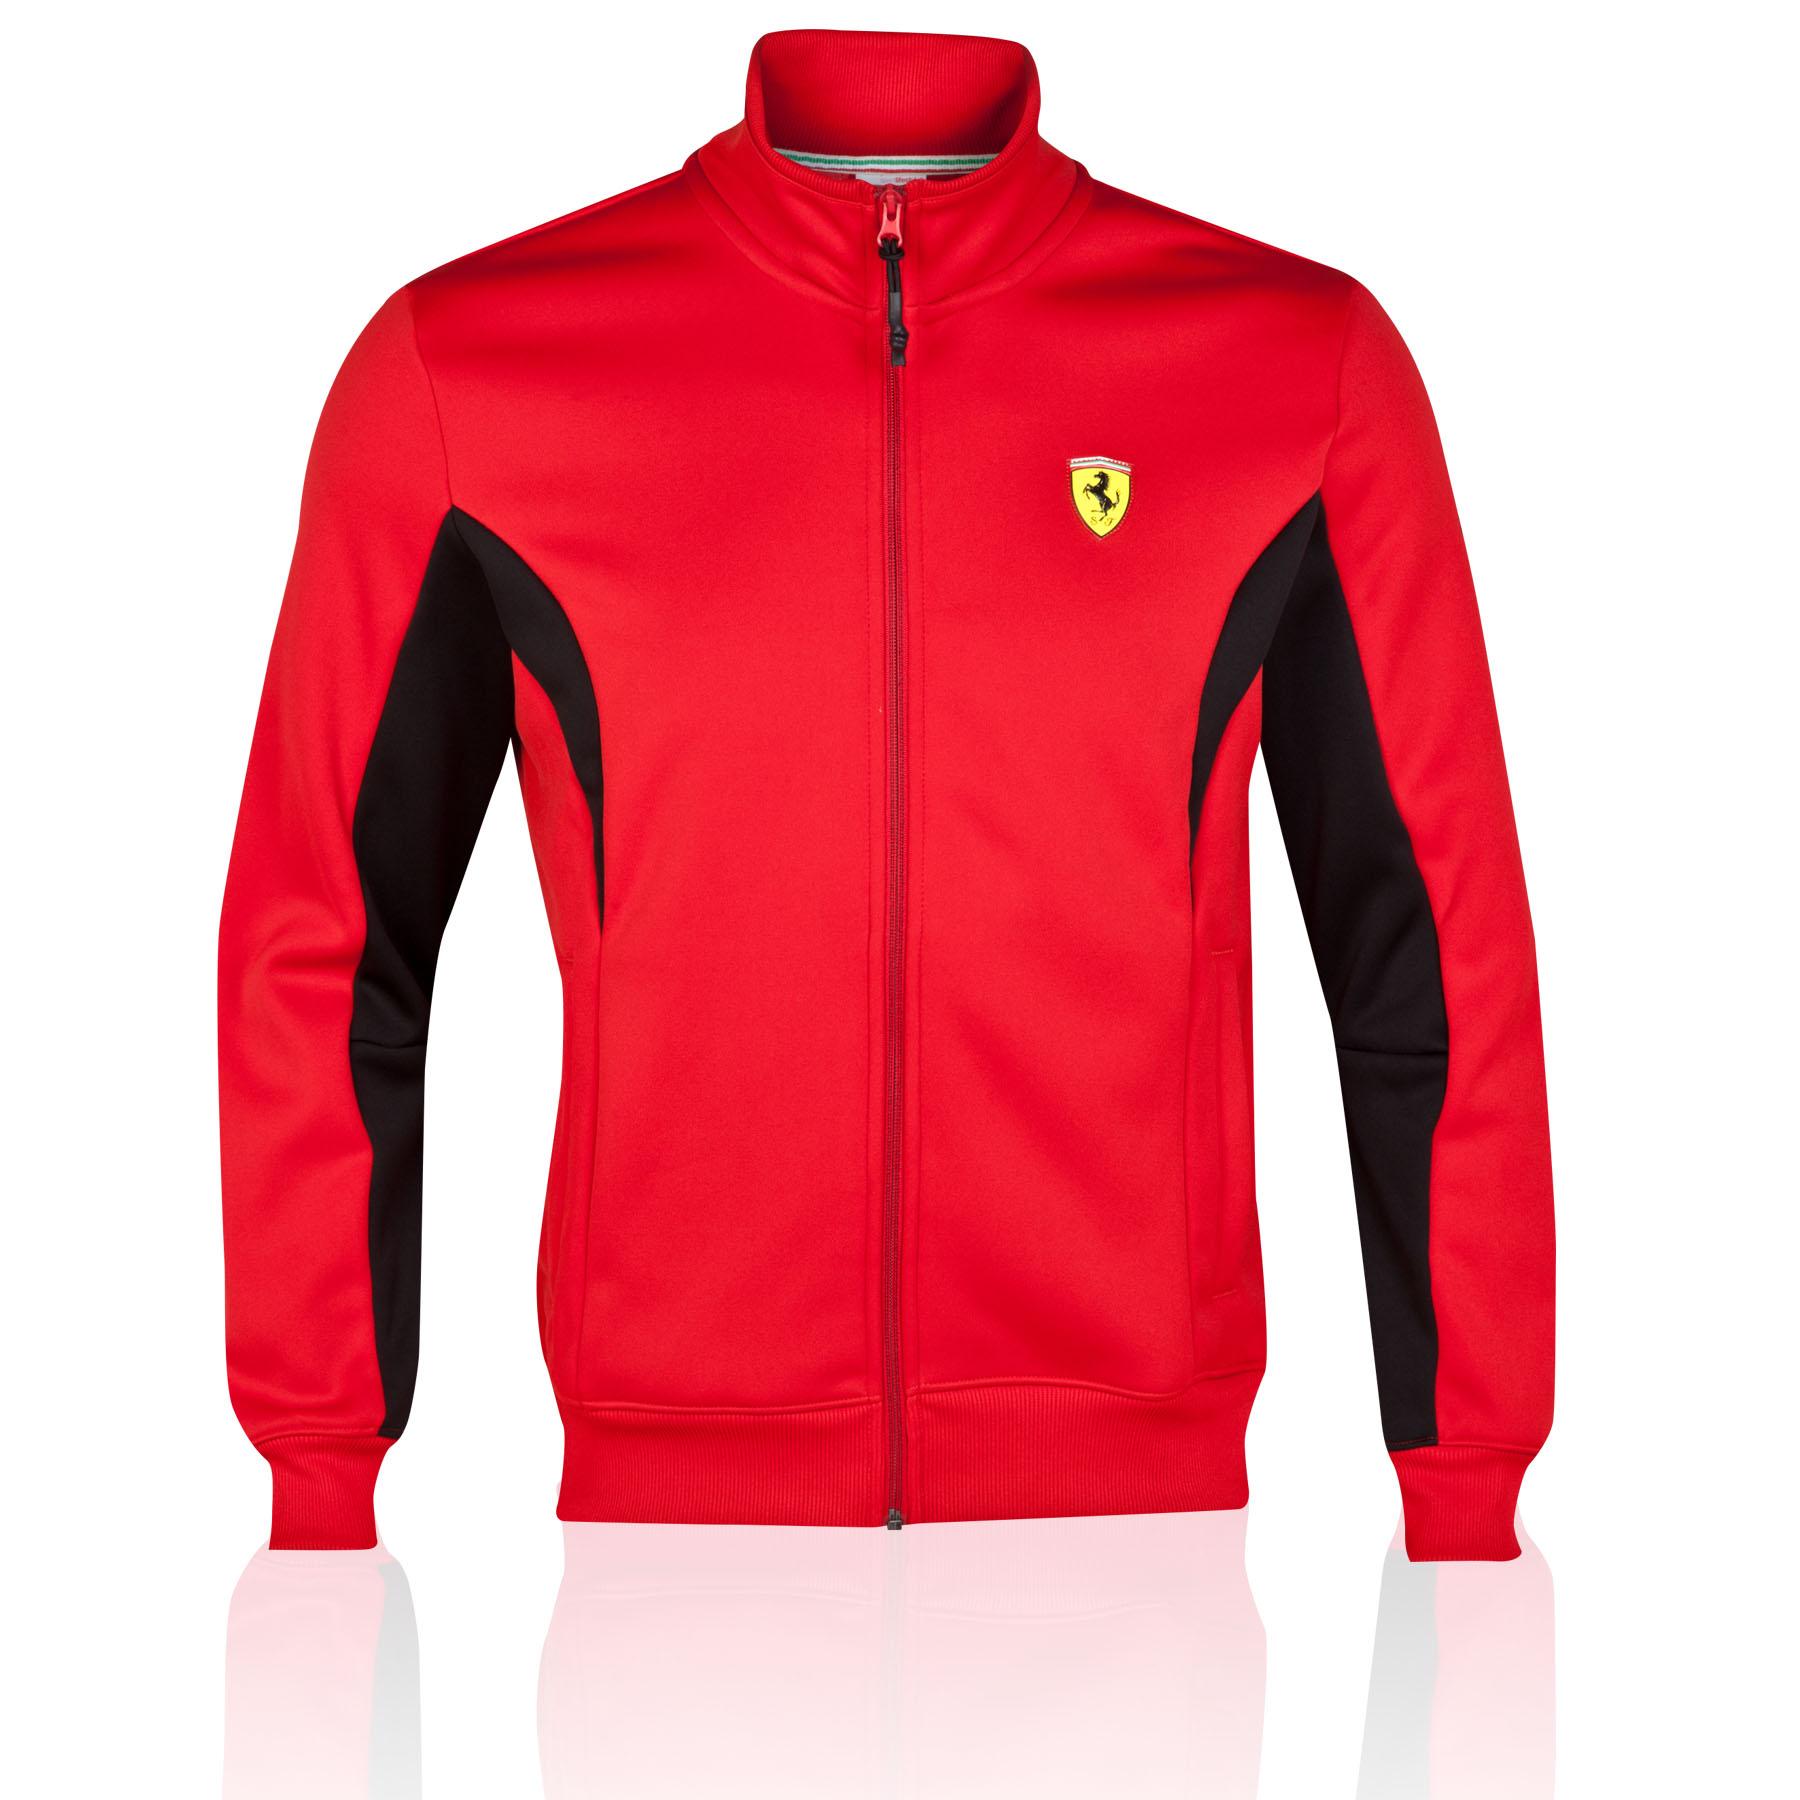 Scuderia Ferrari Softshell Jacket - Red